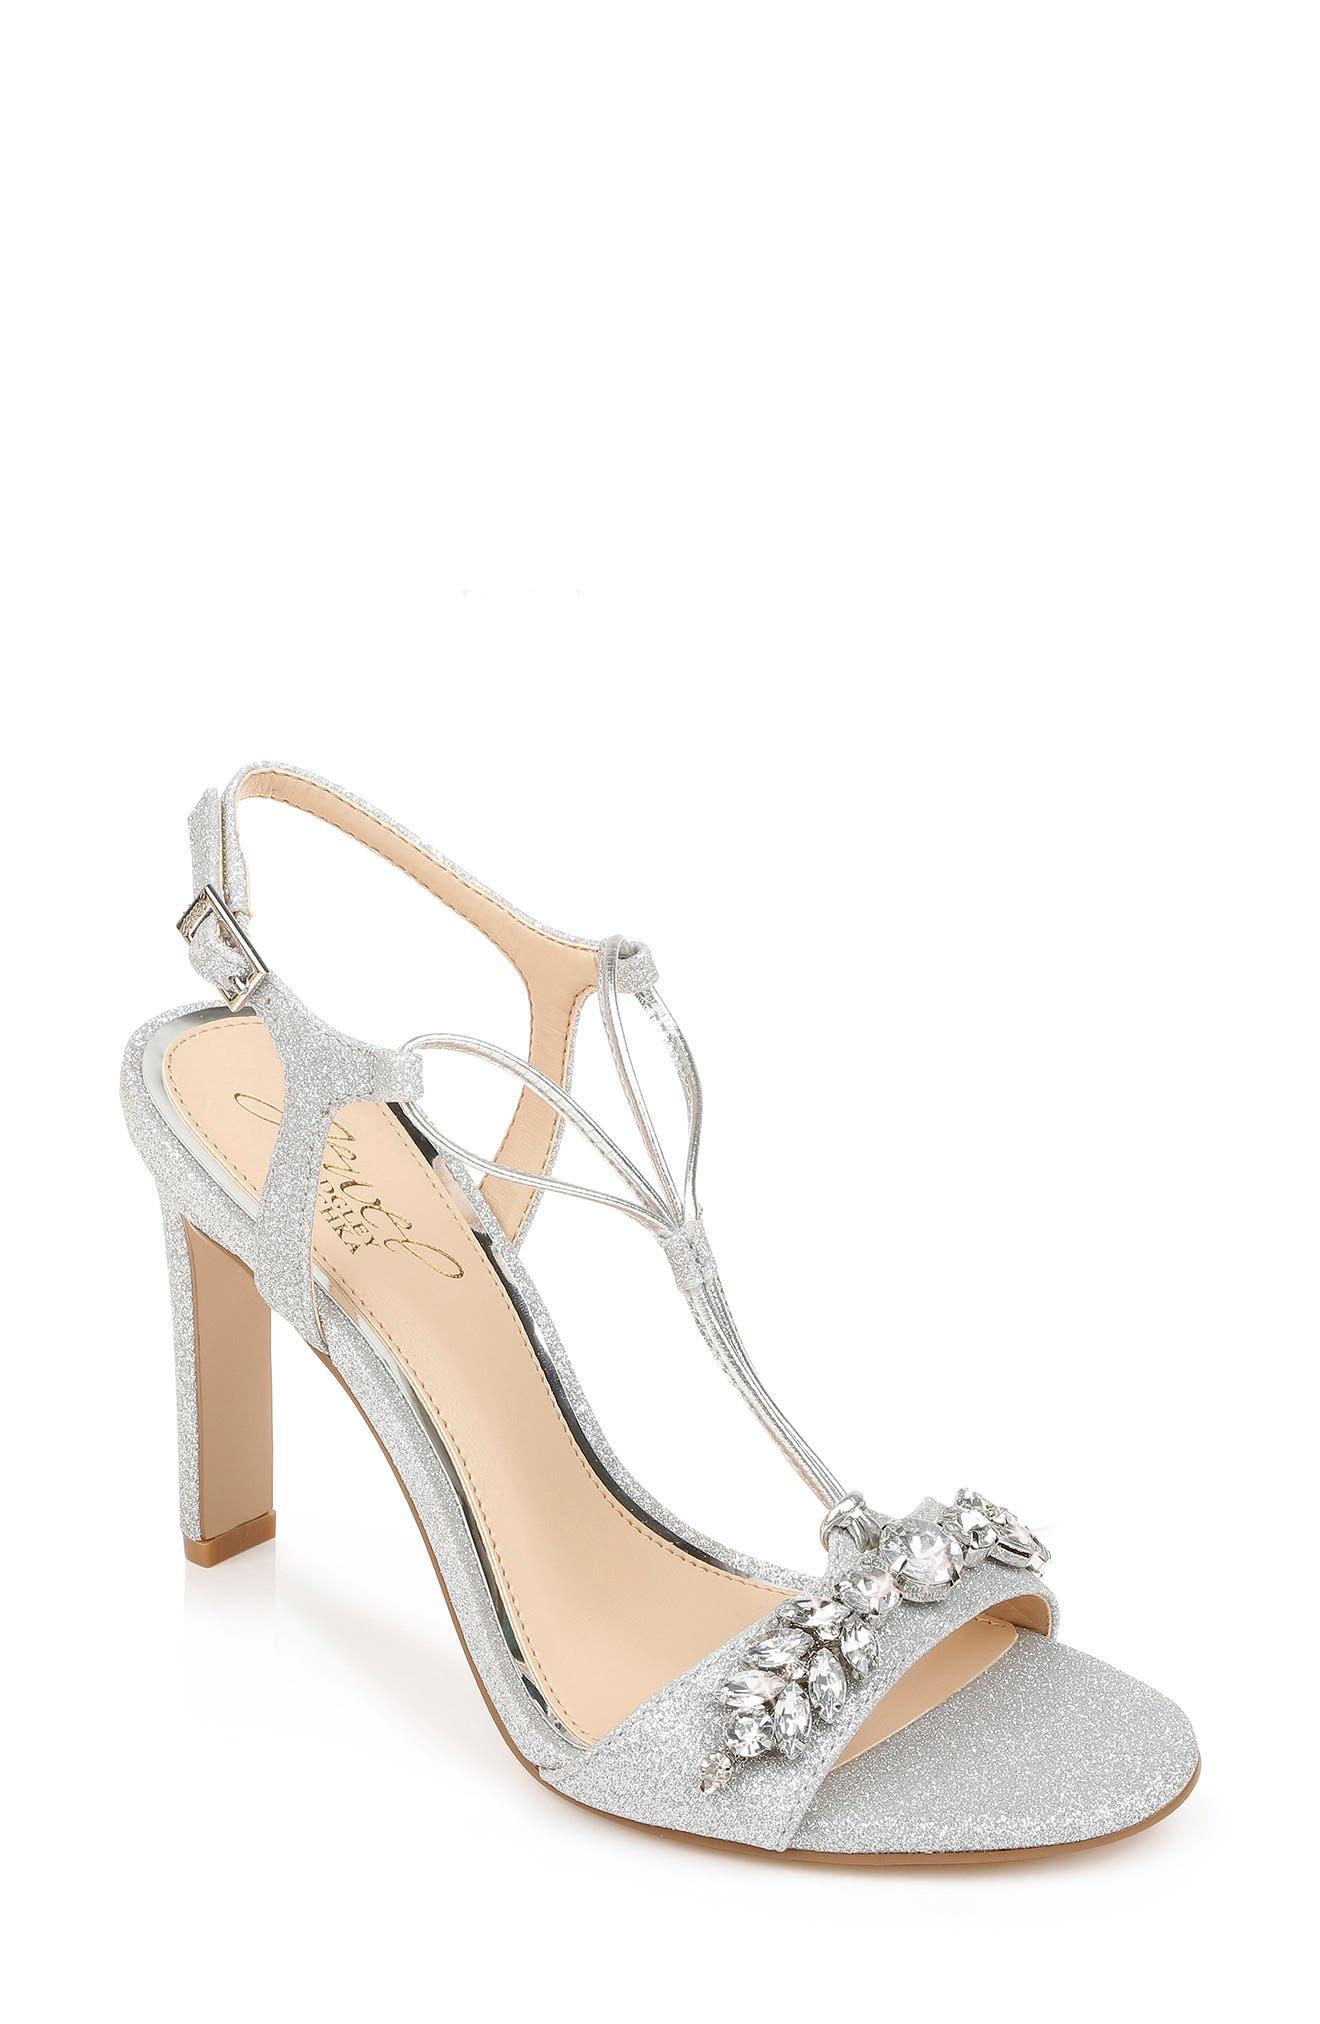 Women's Badgley Mischka Peaches Embellished T-Strap Sandal